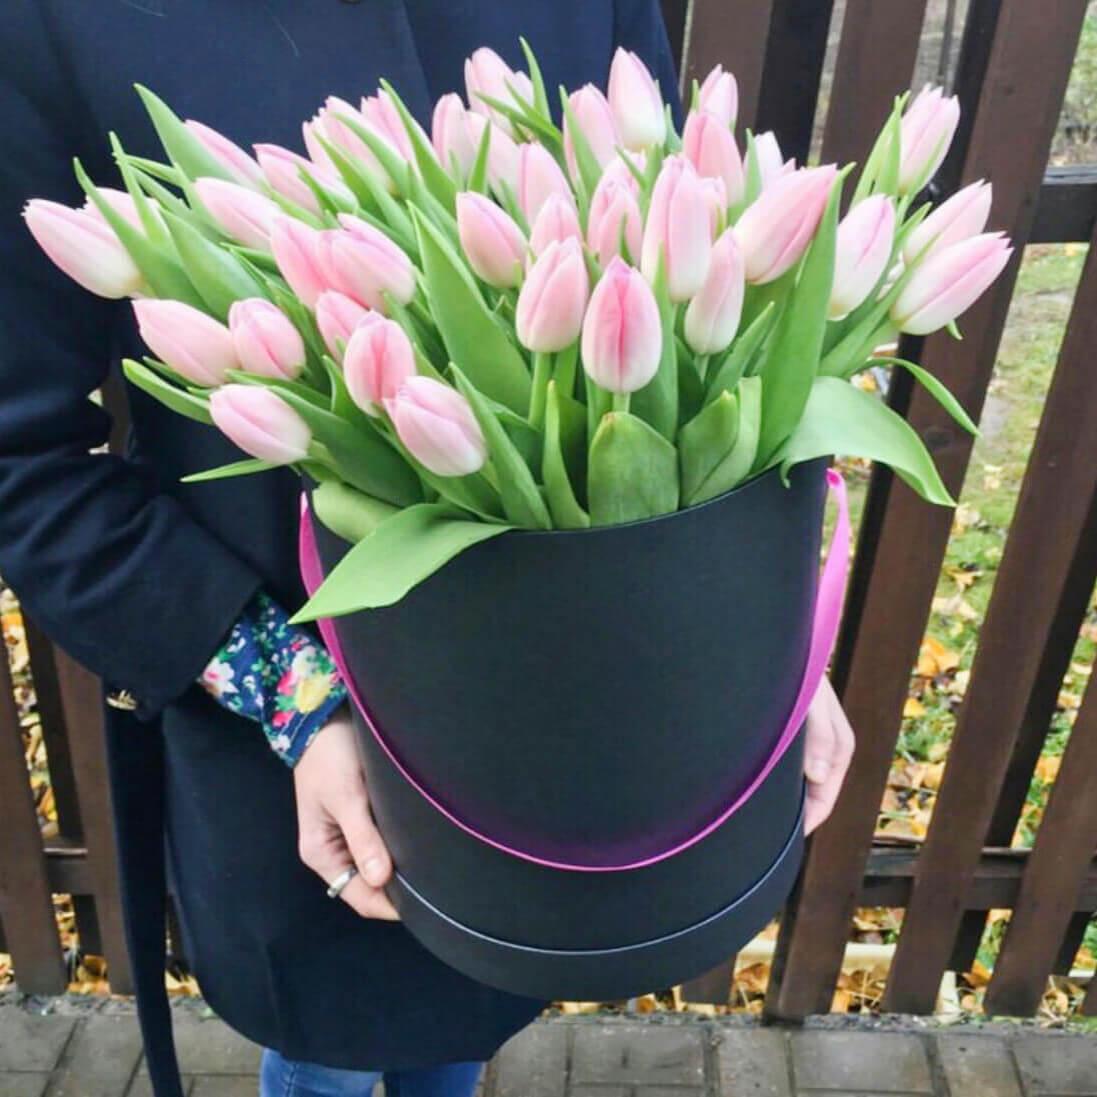 Коробка 49 «Розовых Тюльпанов» Black